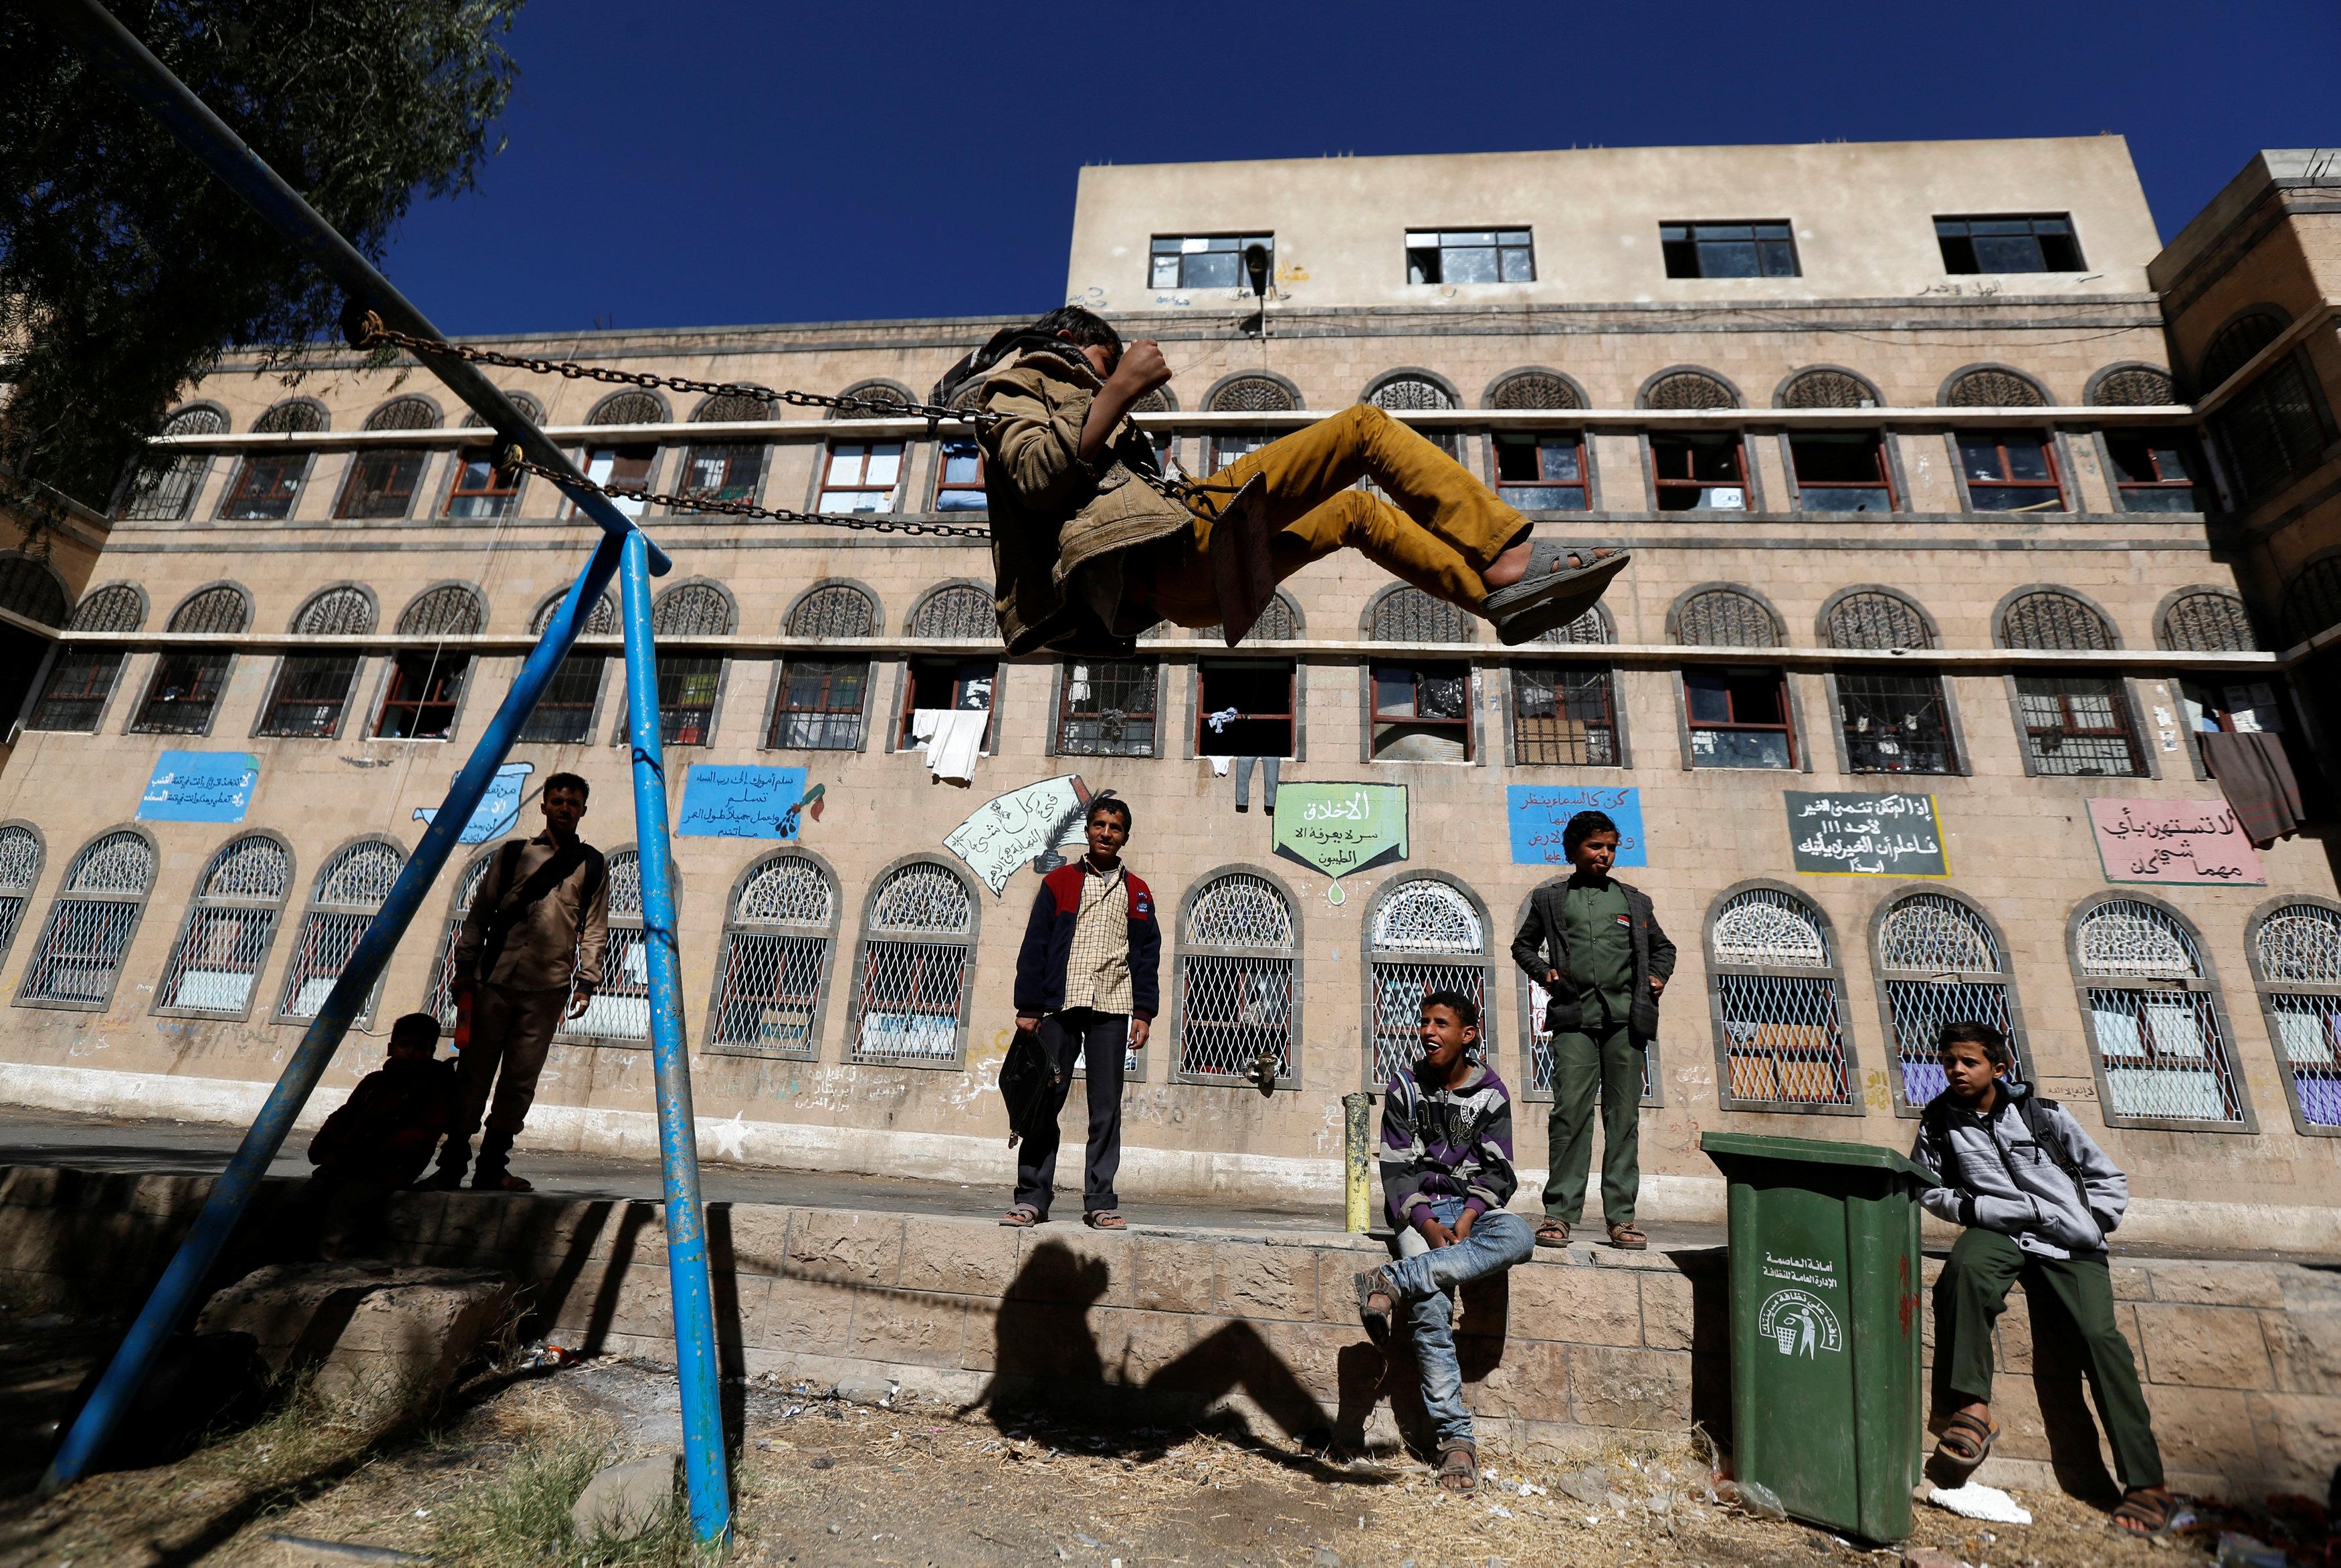 Yemen orphanage braves air strikes